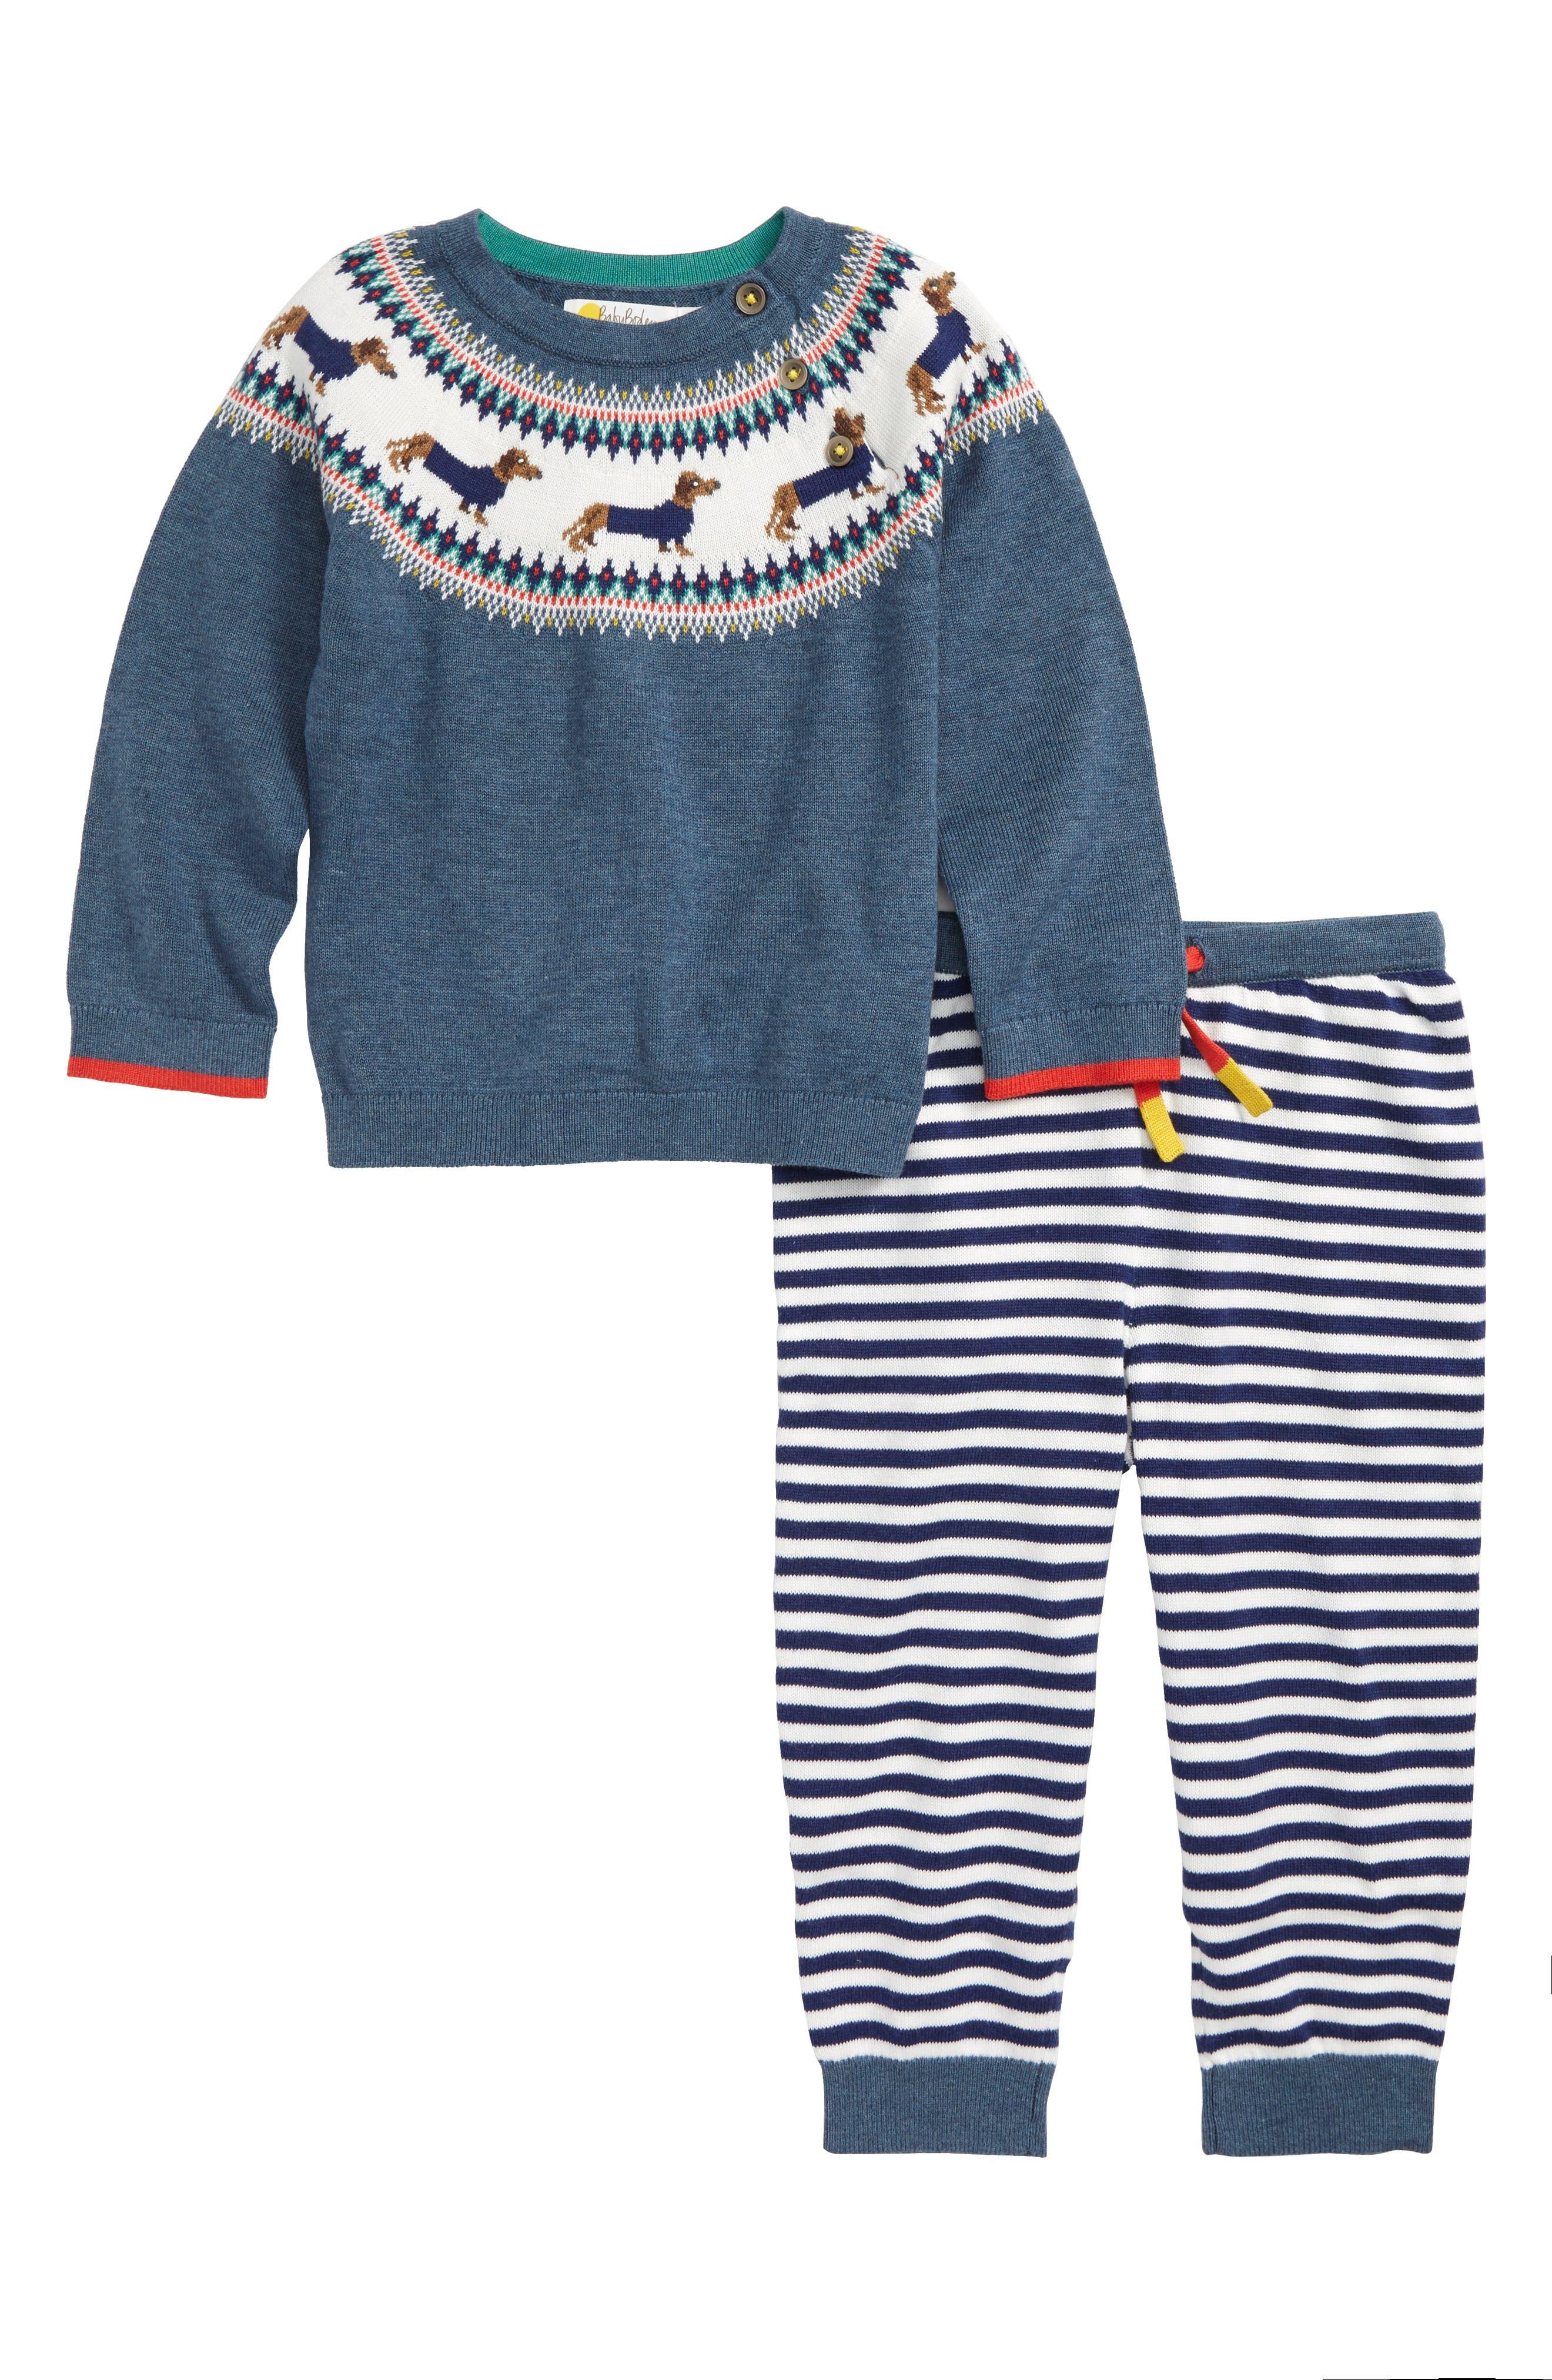 Intarsia Knit Sweater & Pants Set, Main, color, 424